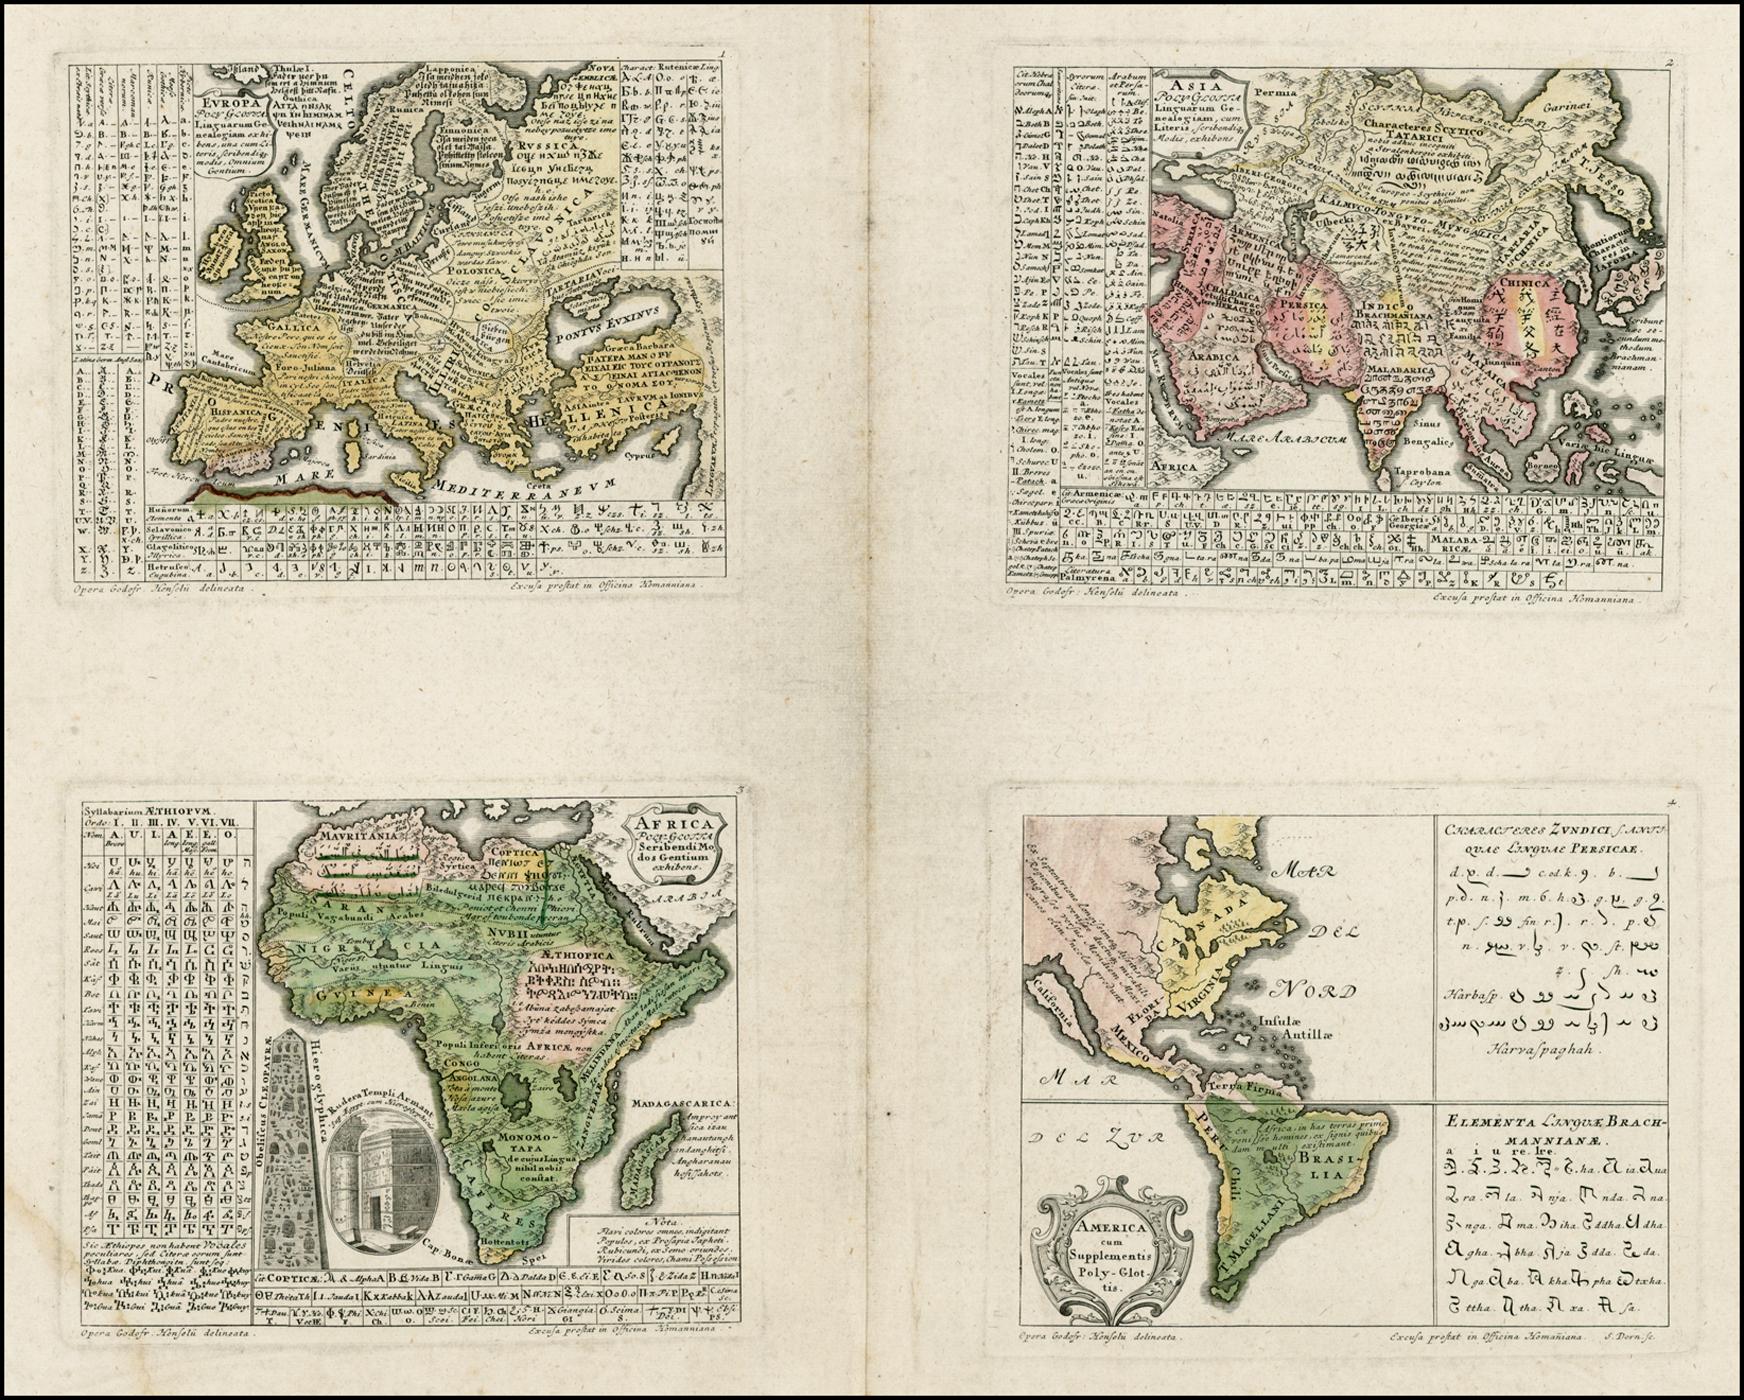 Godofredus Henselius, Synopsis Universae Philologiae, 1741